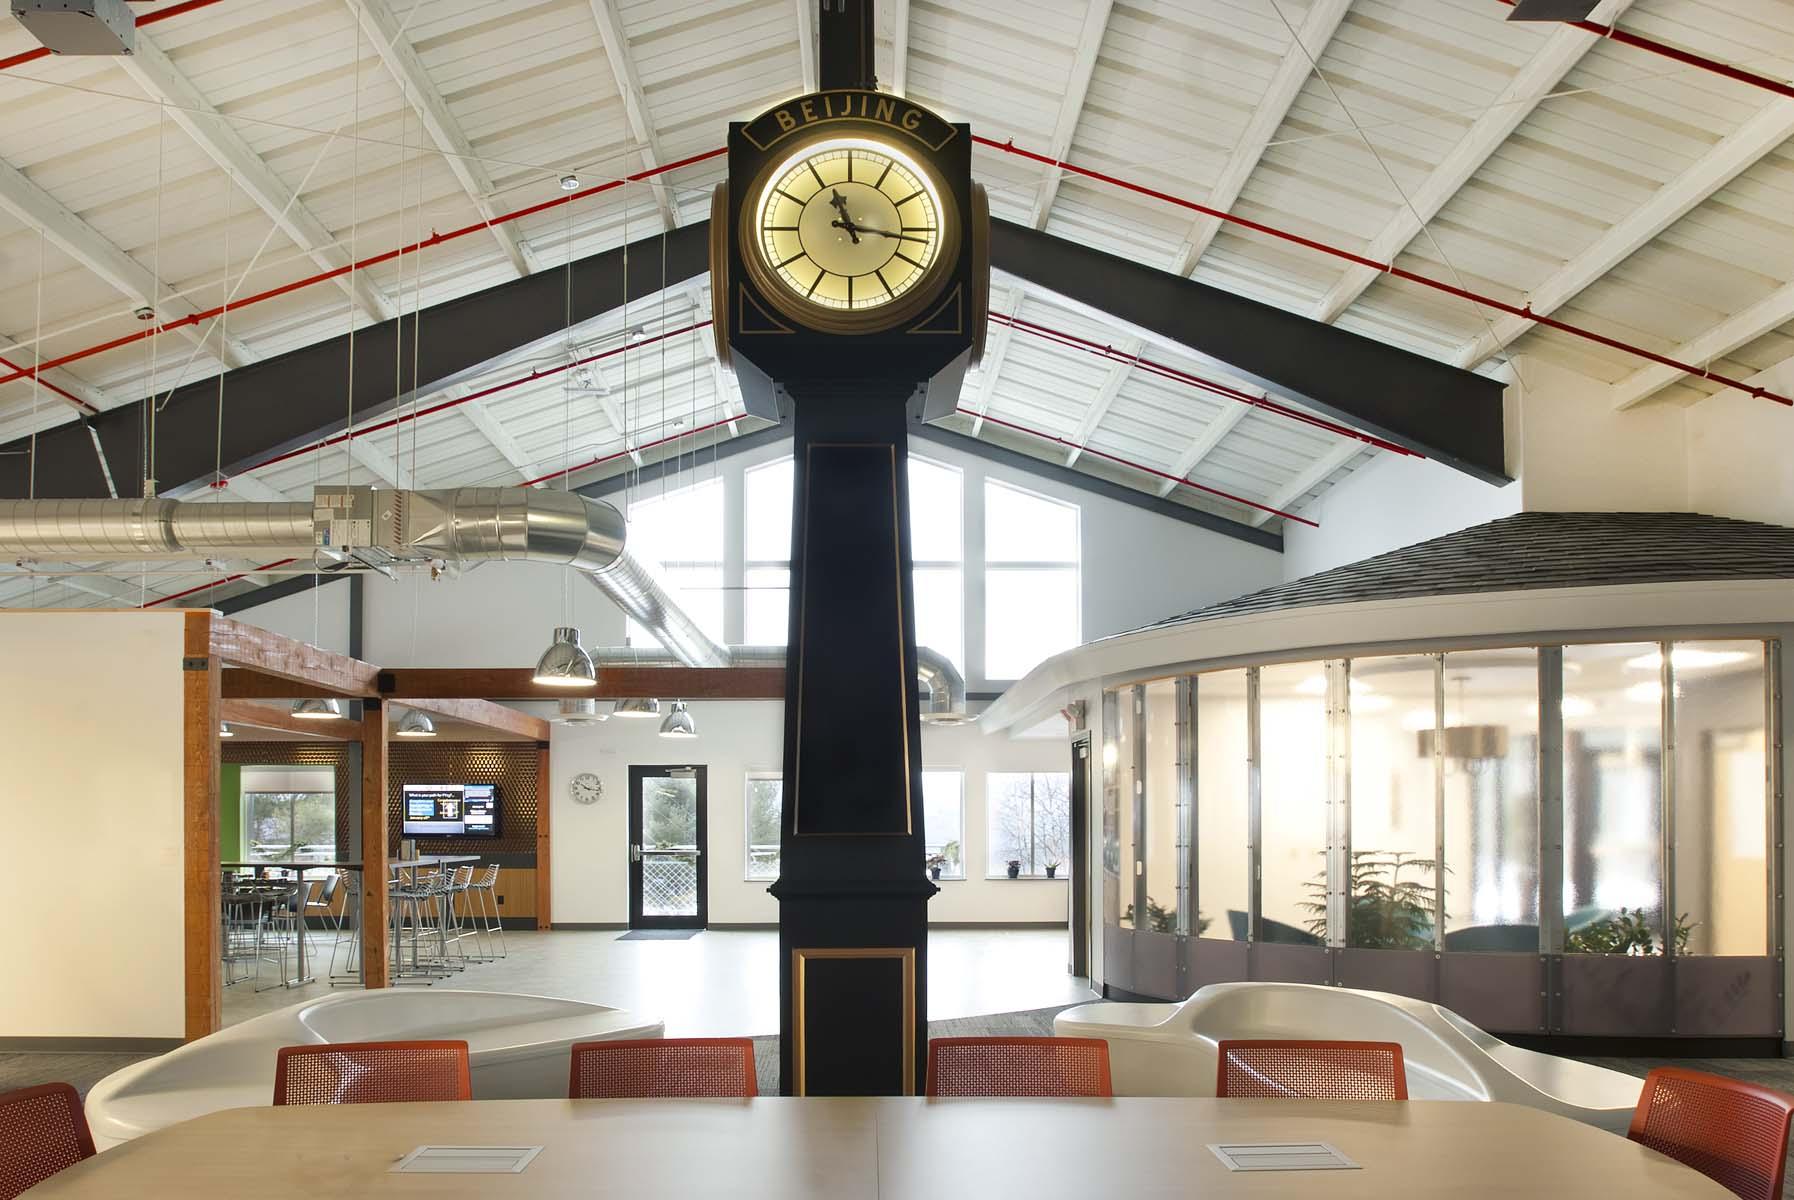 Keurig Green Mountain Innovation Center